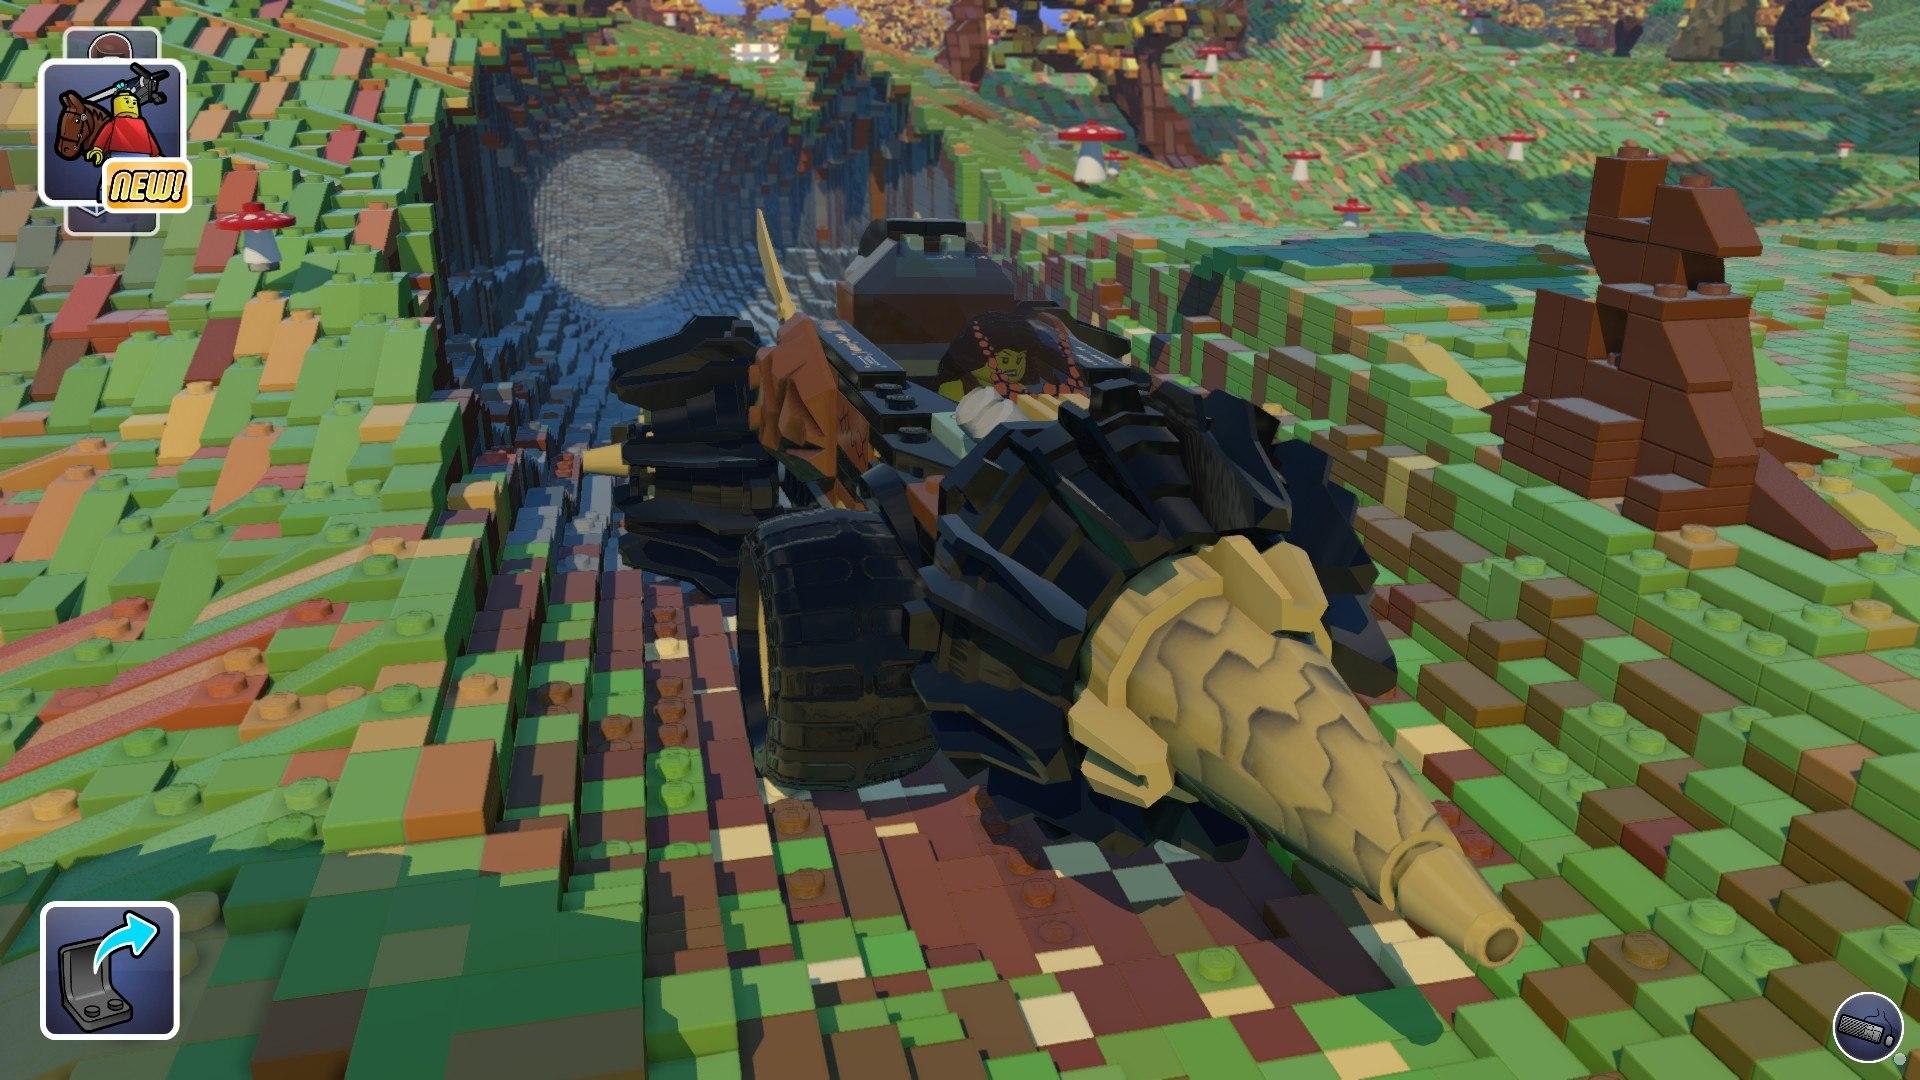 BUY LEGO Worlds Steam CD KEY